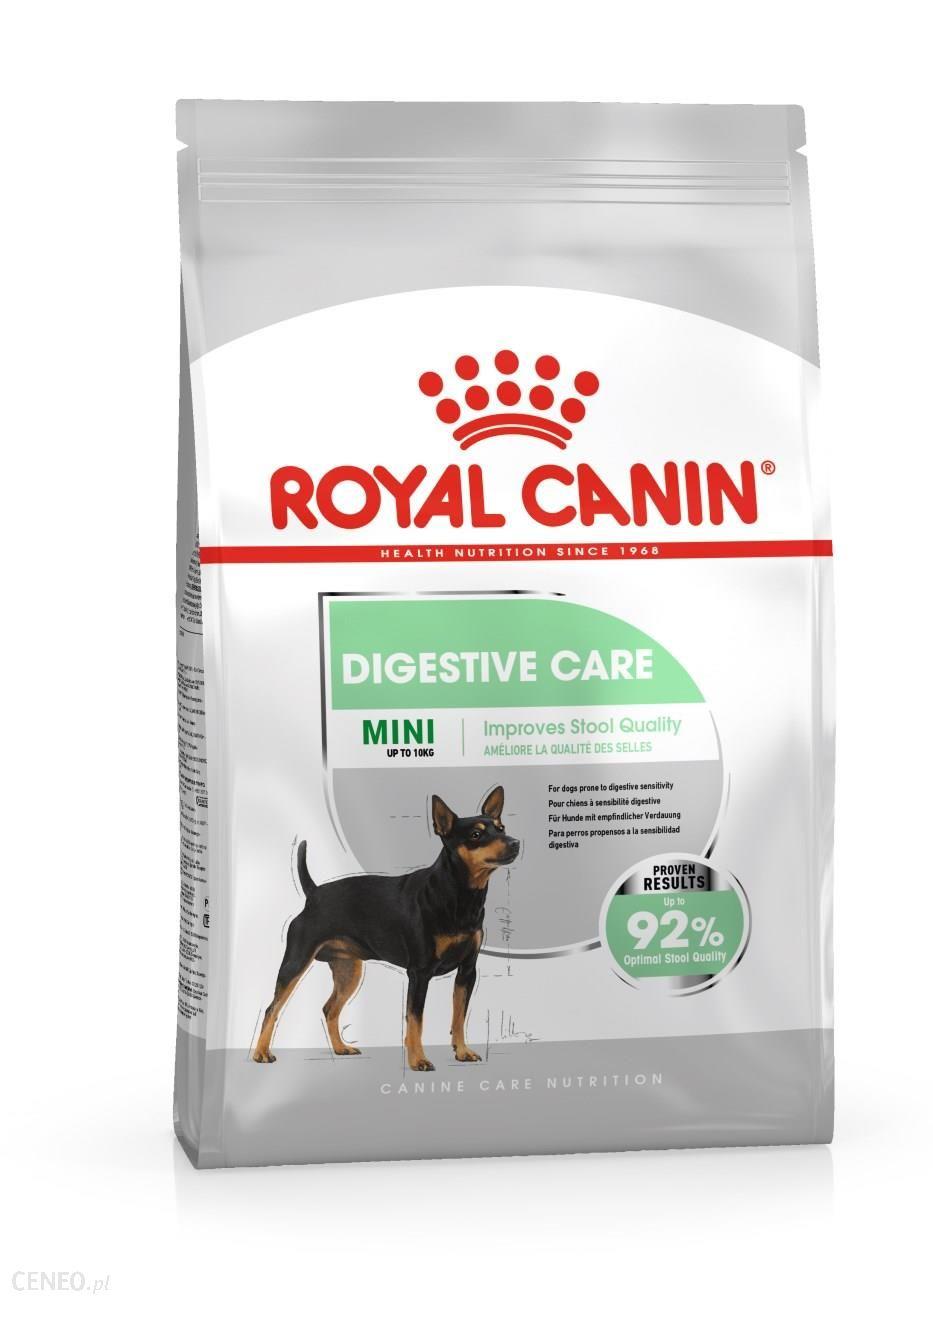 Royal Canin Mini Digestive Care 2x8kg